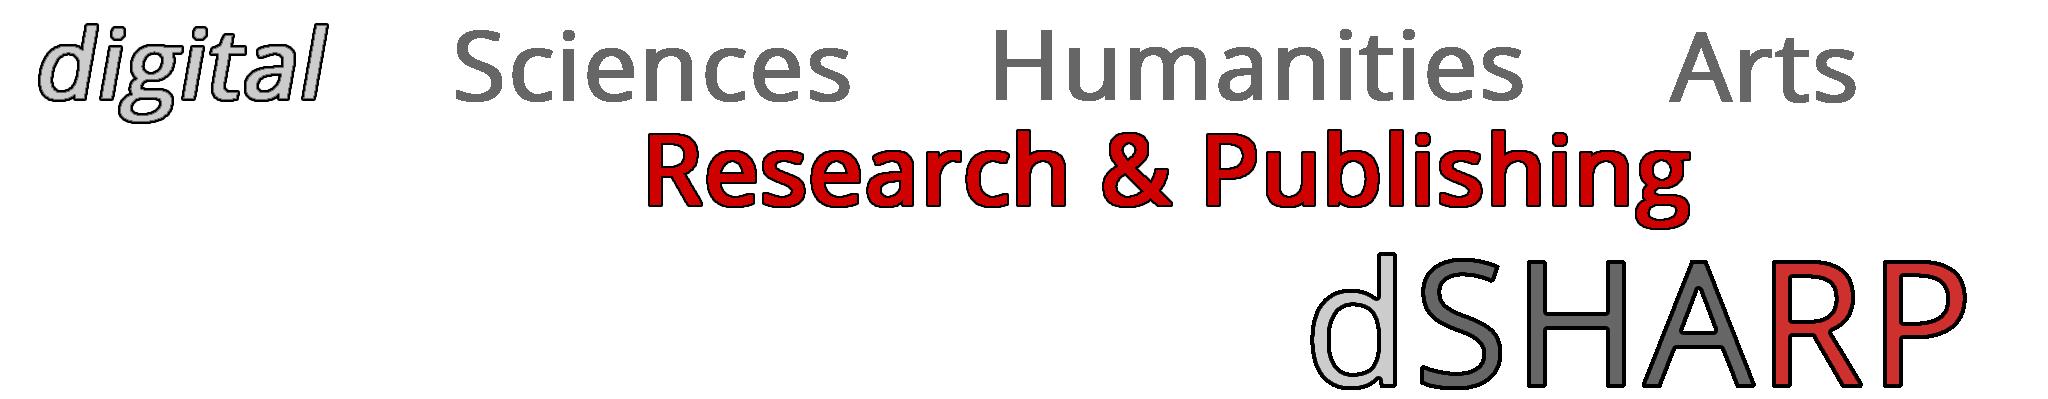 dSHARP: digital Sciences, Humanities, Arts: Research & Publishing